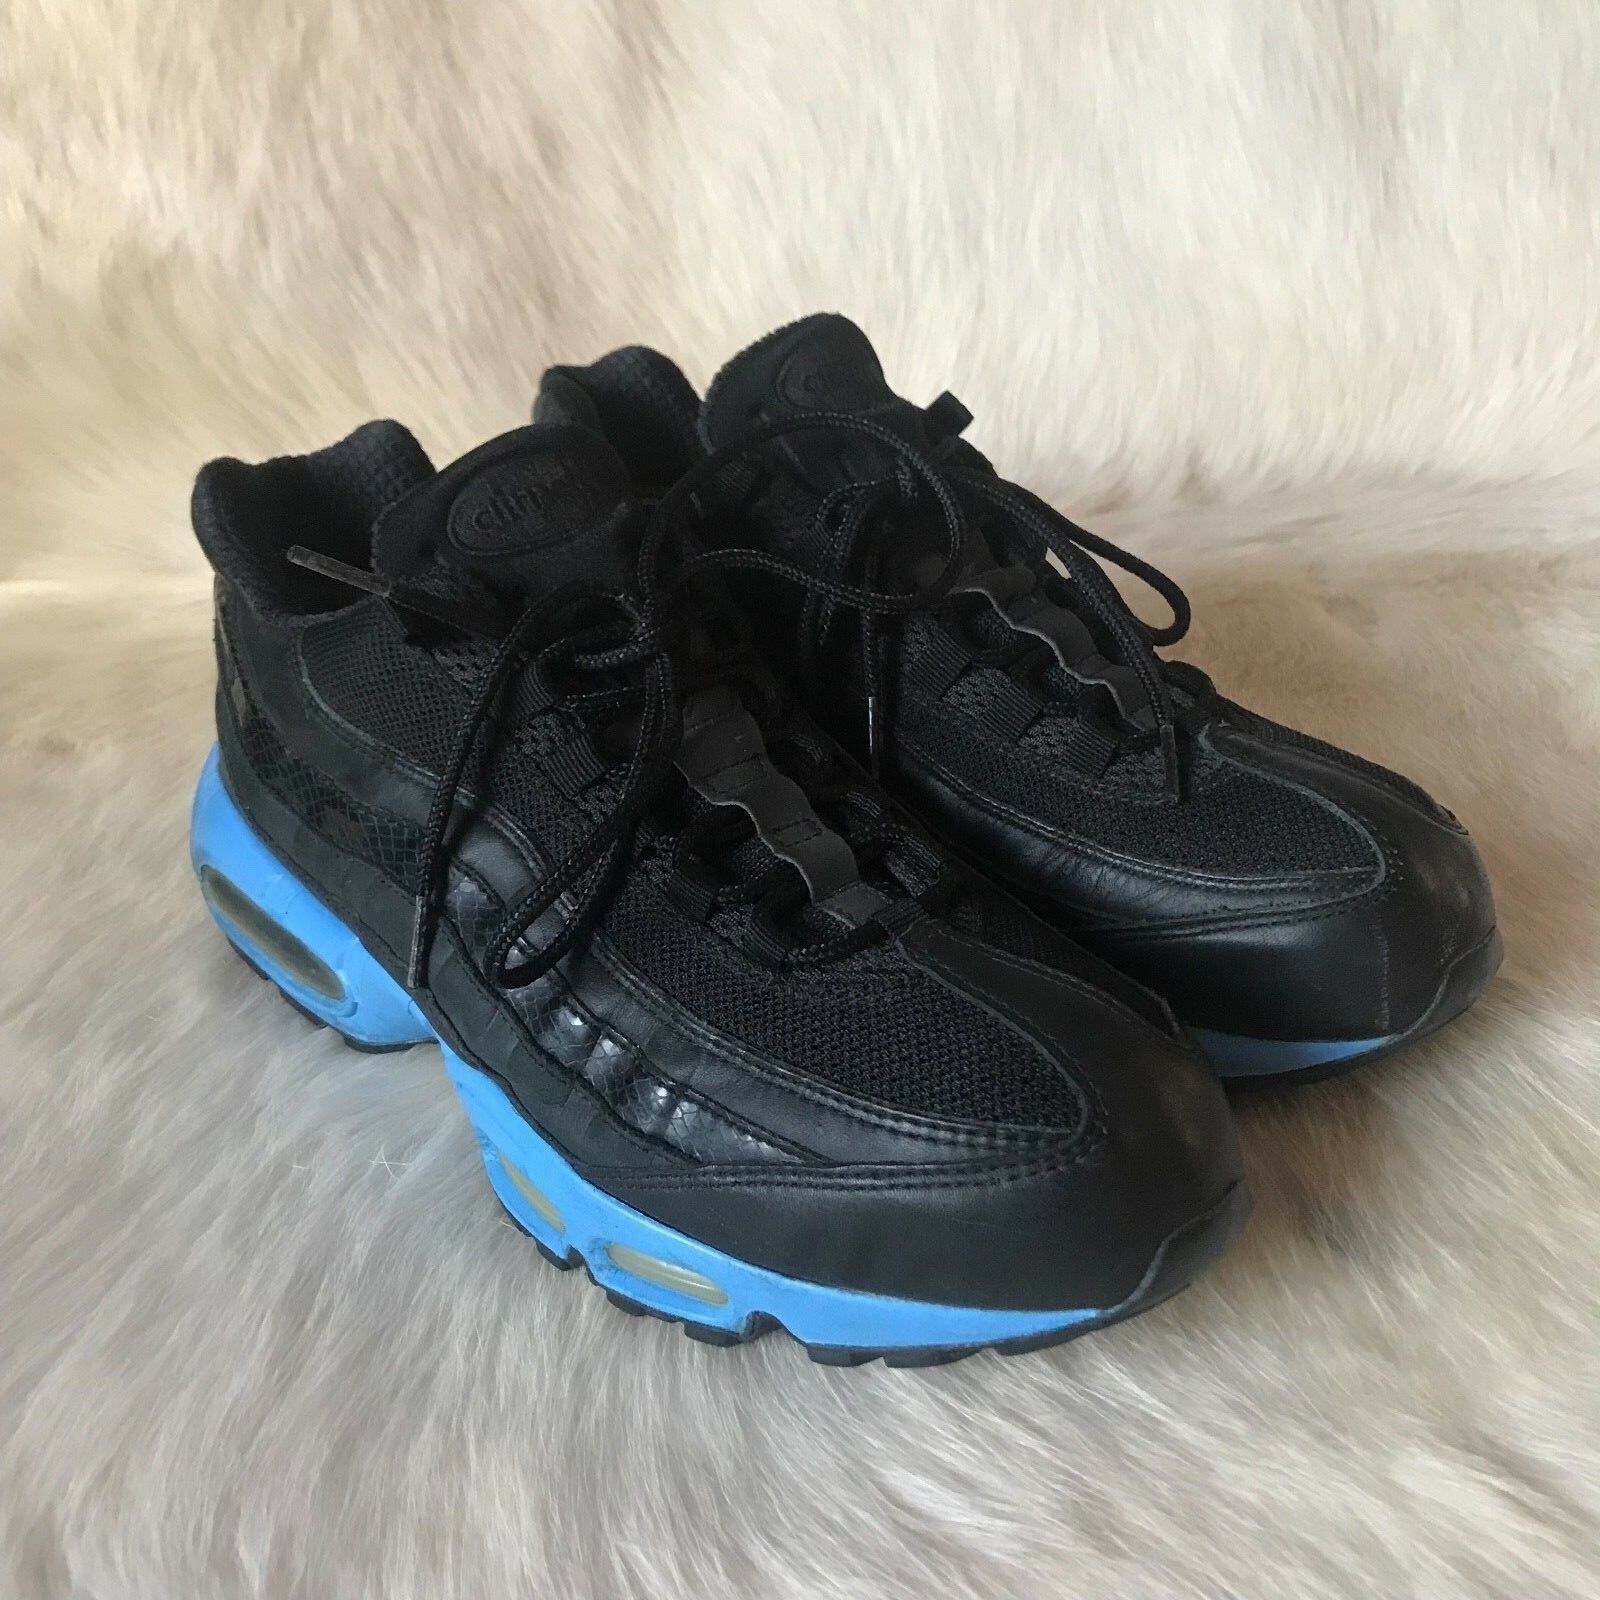 2006 Nike Air Max 95 BLACK UNIVERSITY BLUE UNC 1 609048-006 12